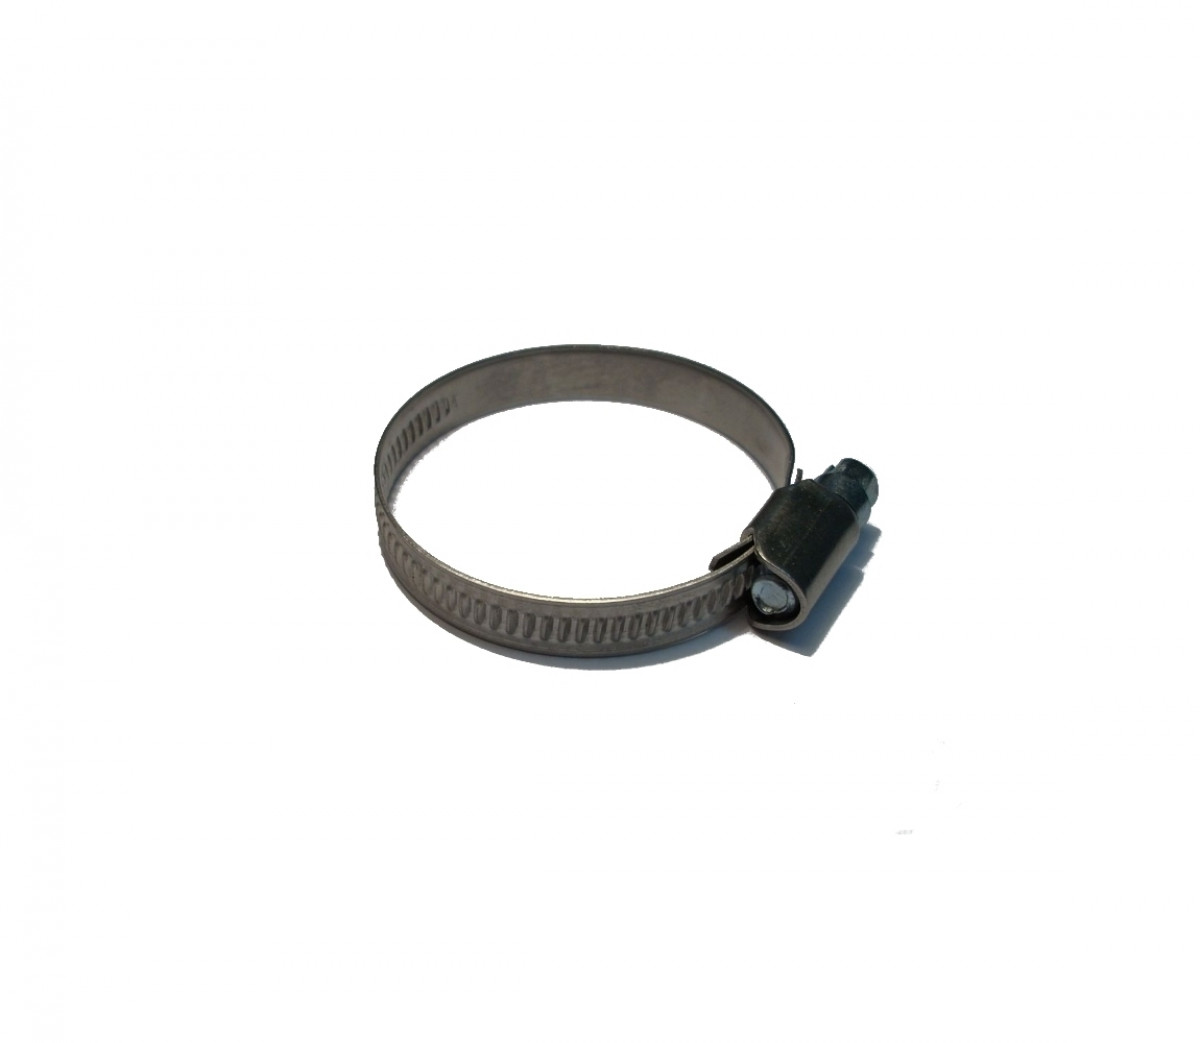 Marimex | Hadicová spona 32-50 mm | 11009601